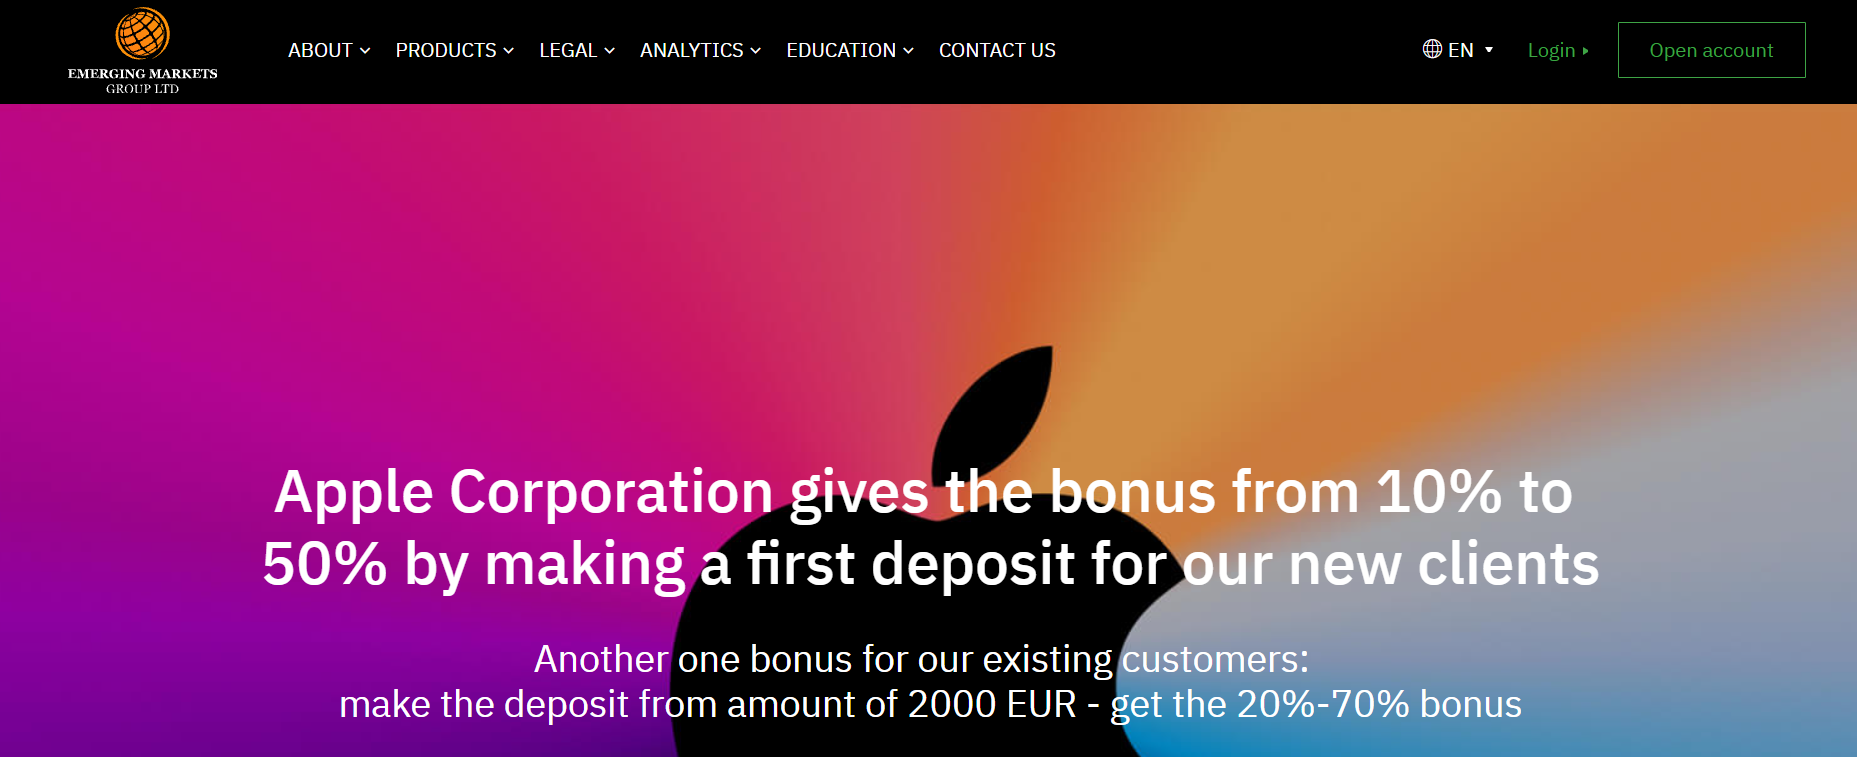 emerging markets group официальный сайт обмана